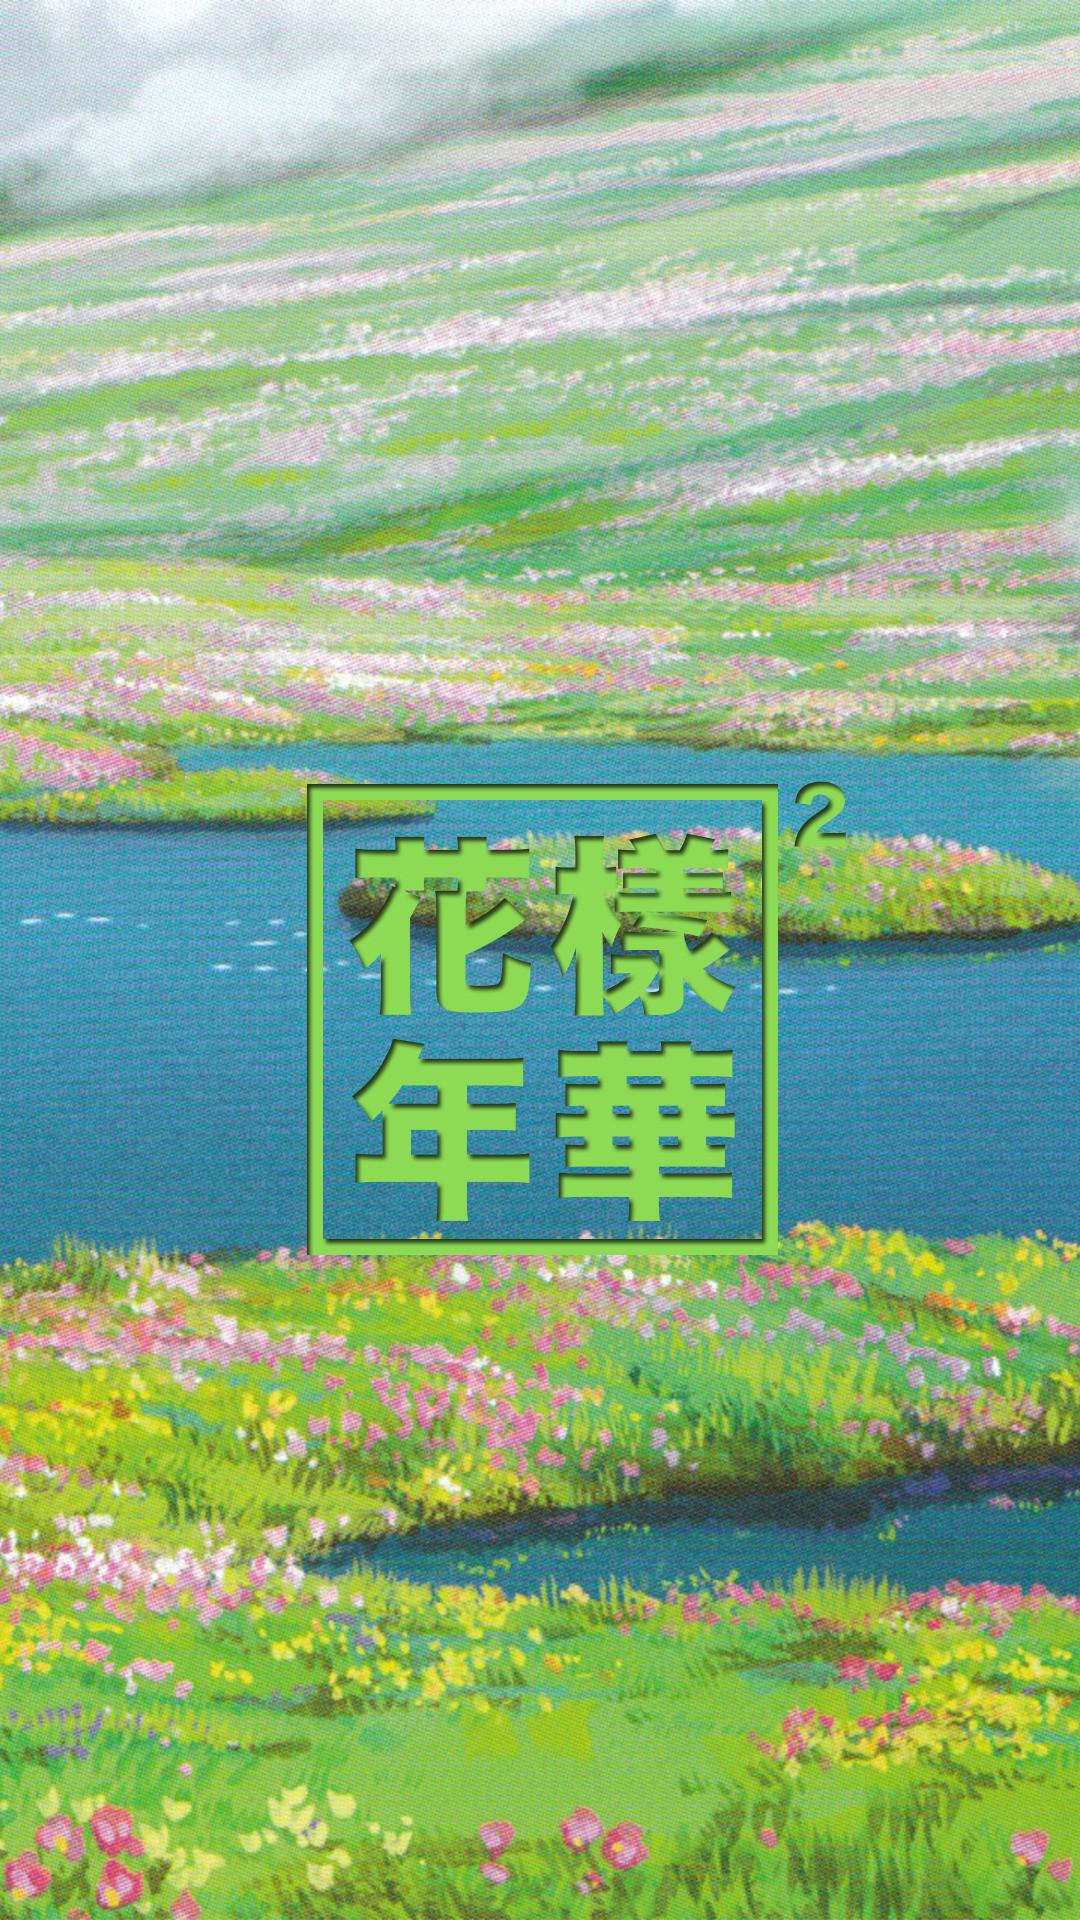 holytaes: BTS x Howl's Moving Castle Wallpapers … – lips like sakura  petals